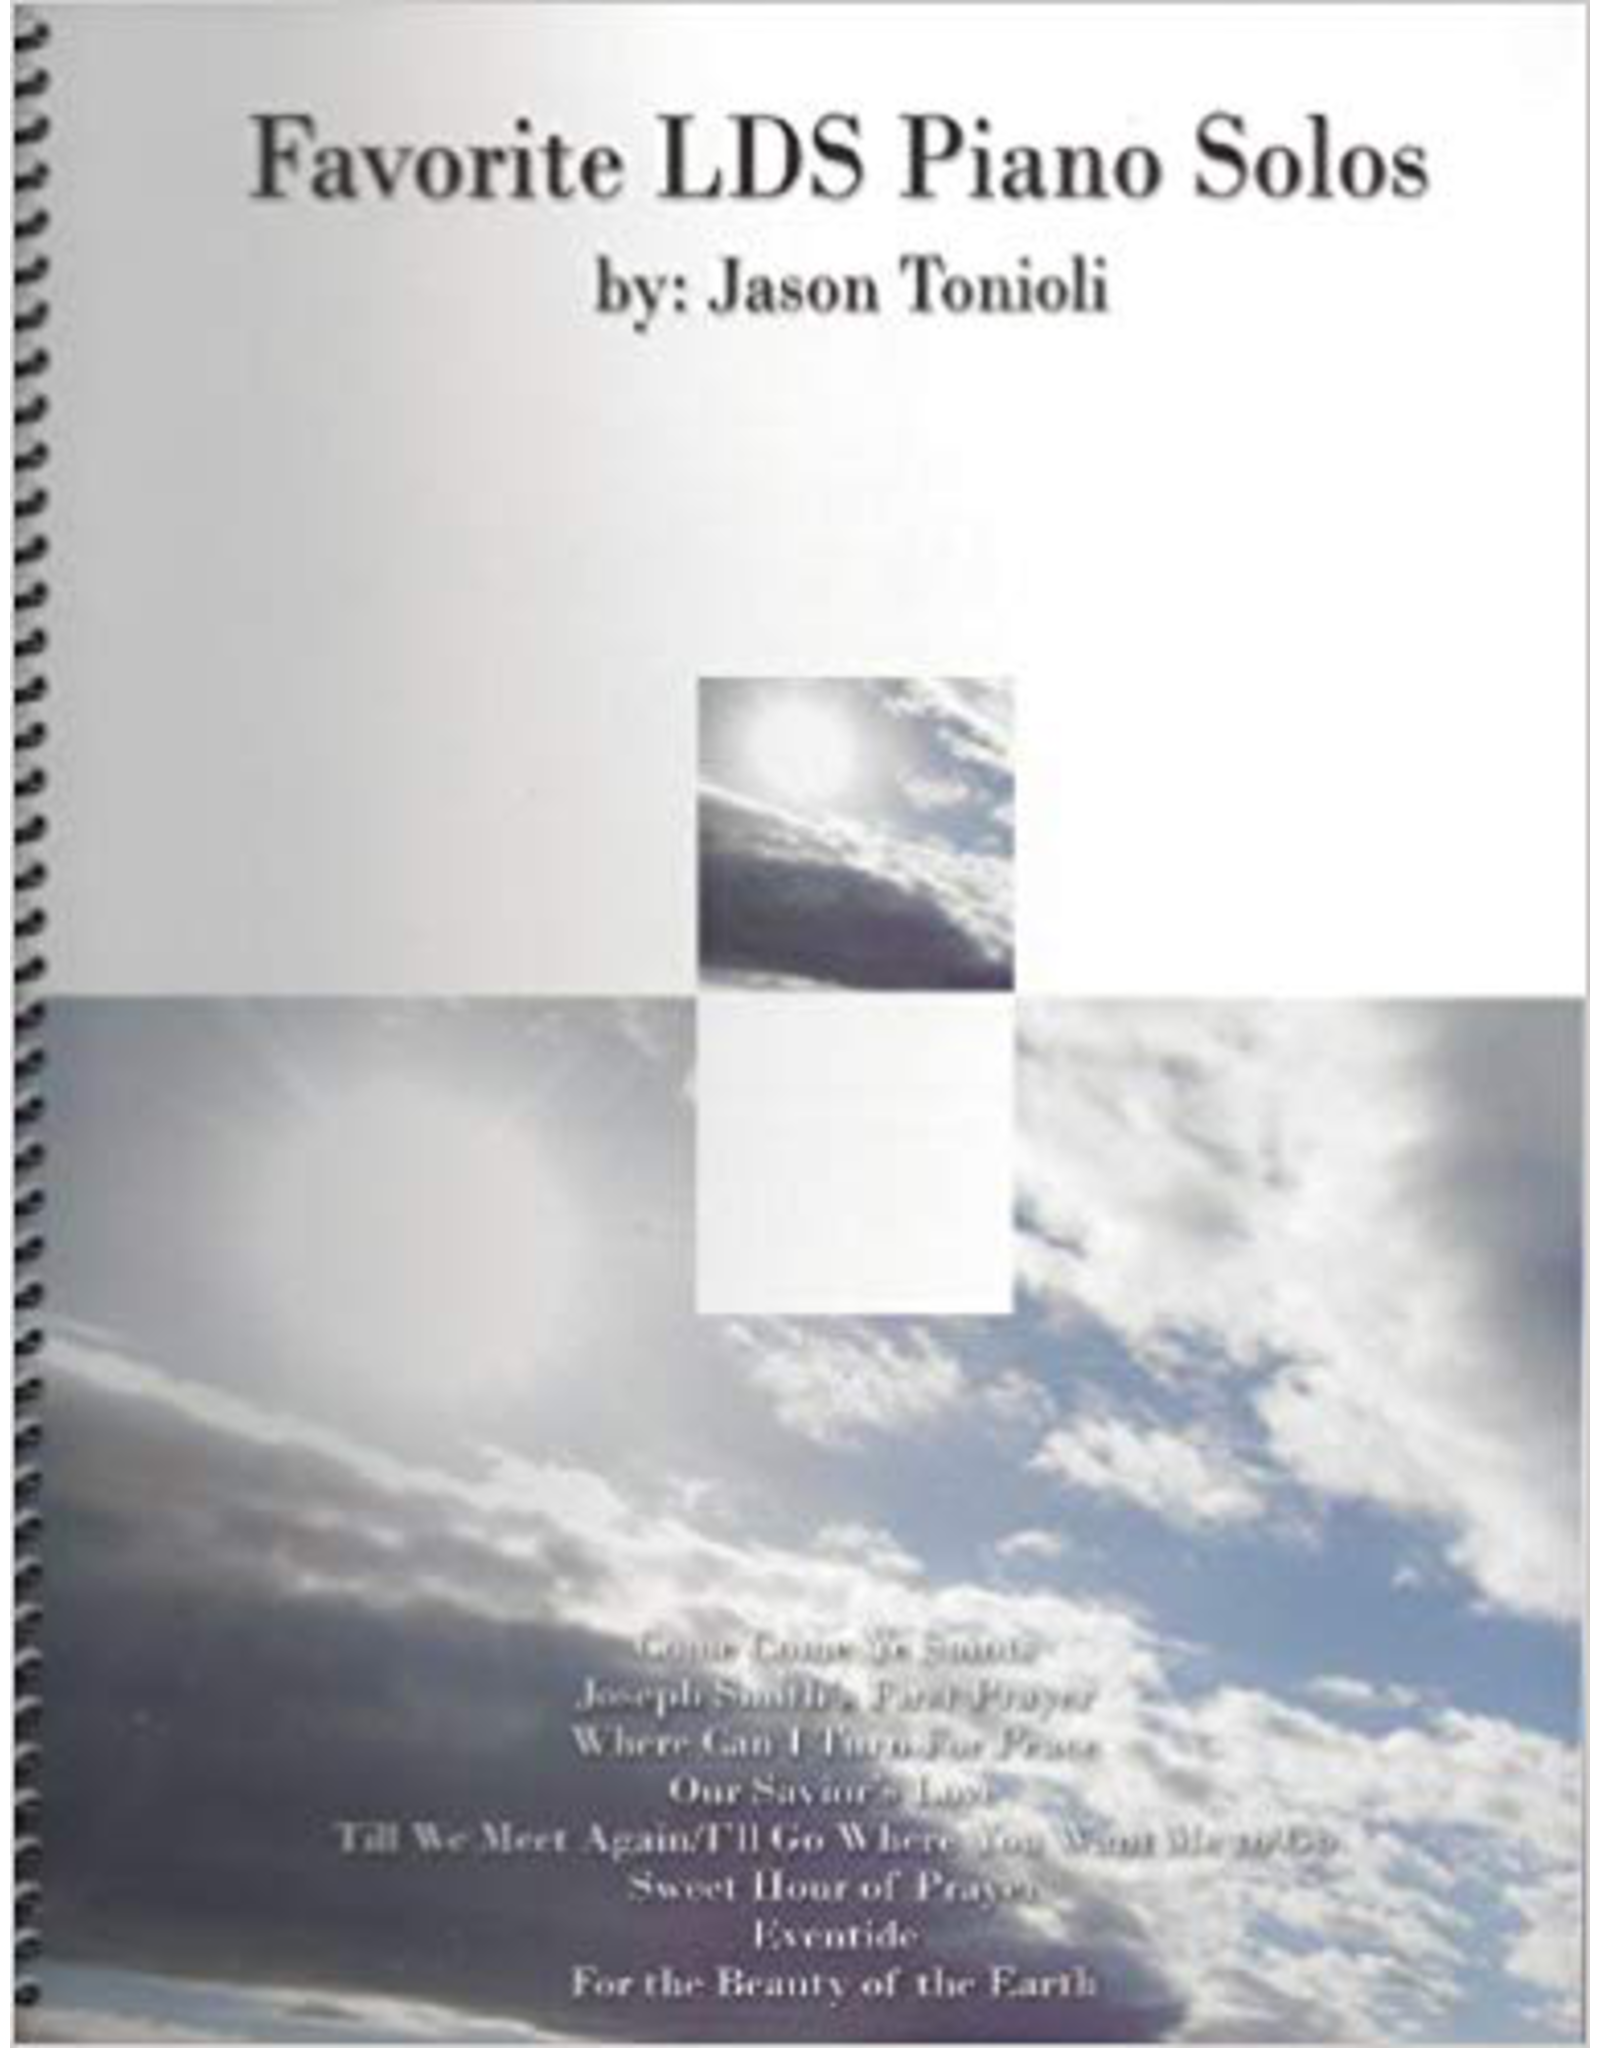 Jason Tonioli Favorite LDS Piano Solos 1 by Jason Tonioli